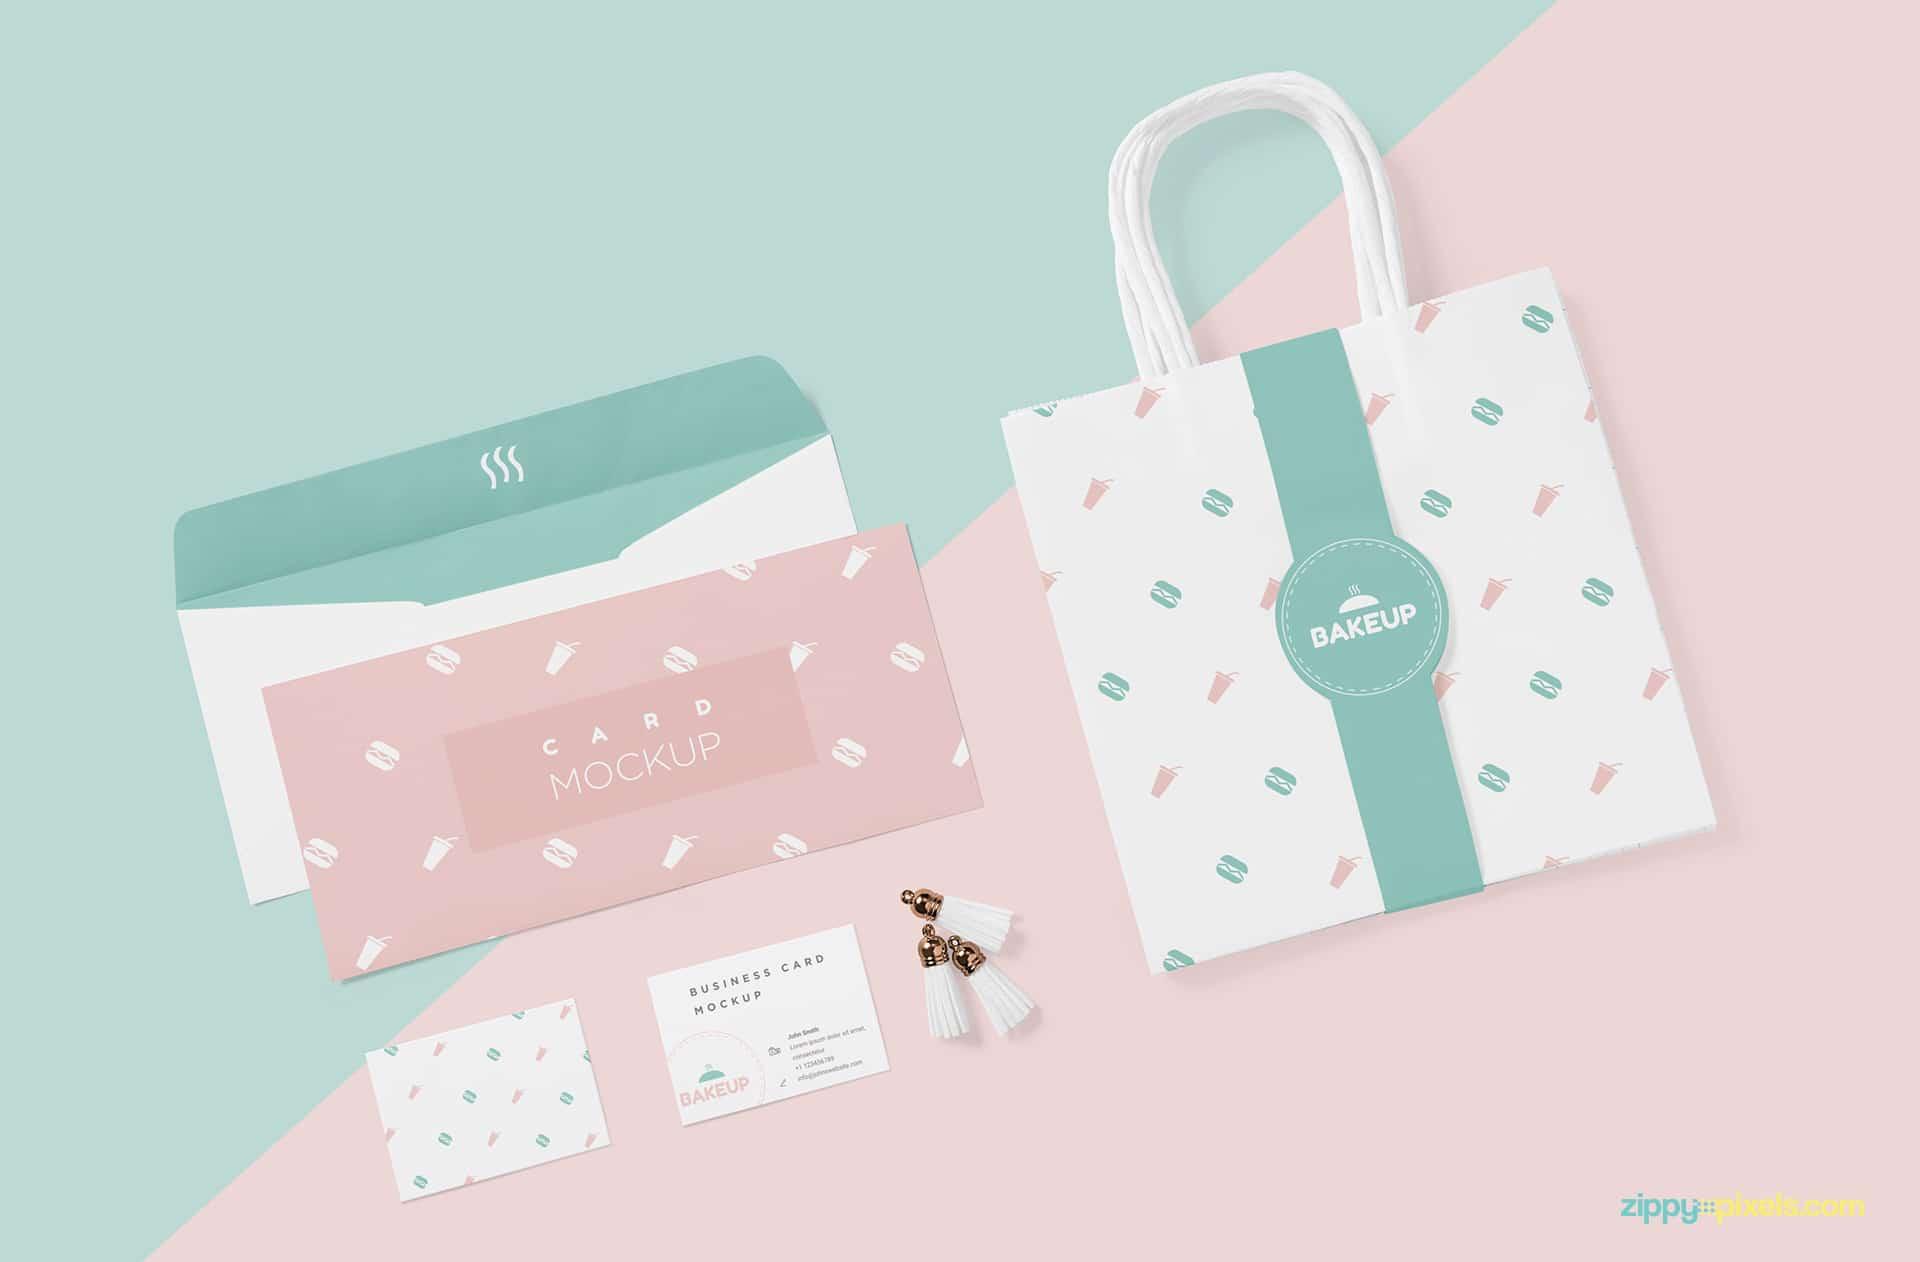 Useful tote bag psd mockup for free designhooks tote bag with business card invitation card psd mockup colourmoves